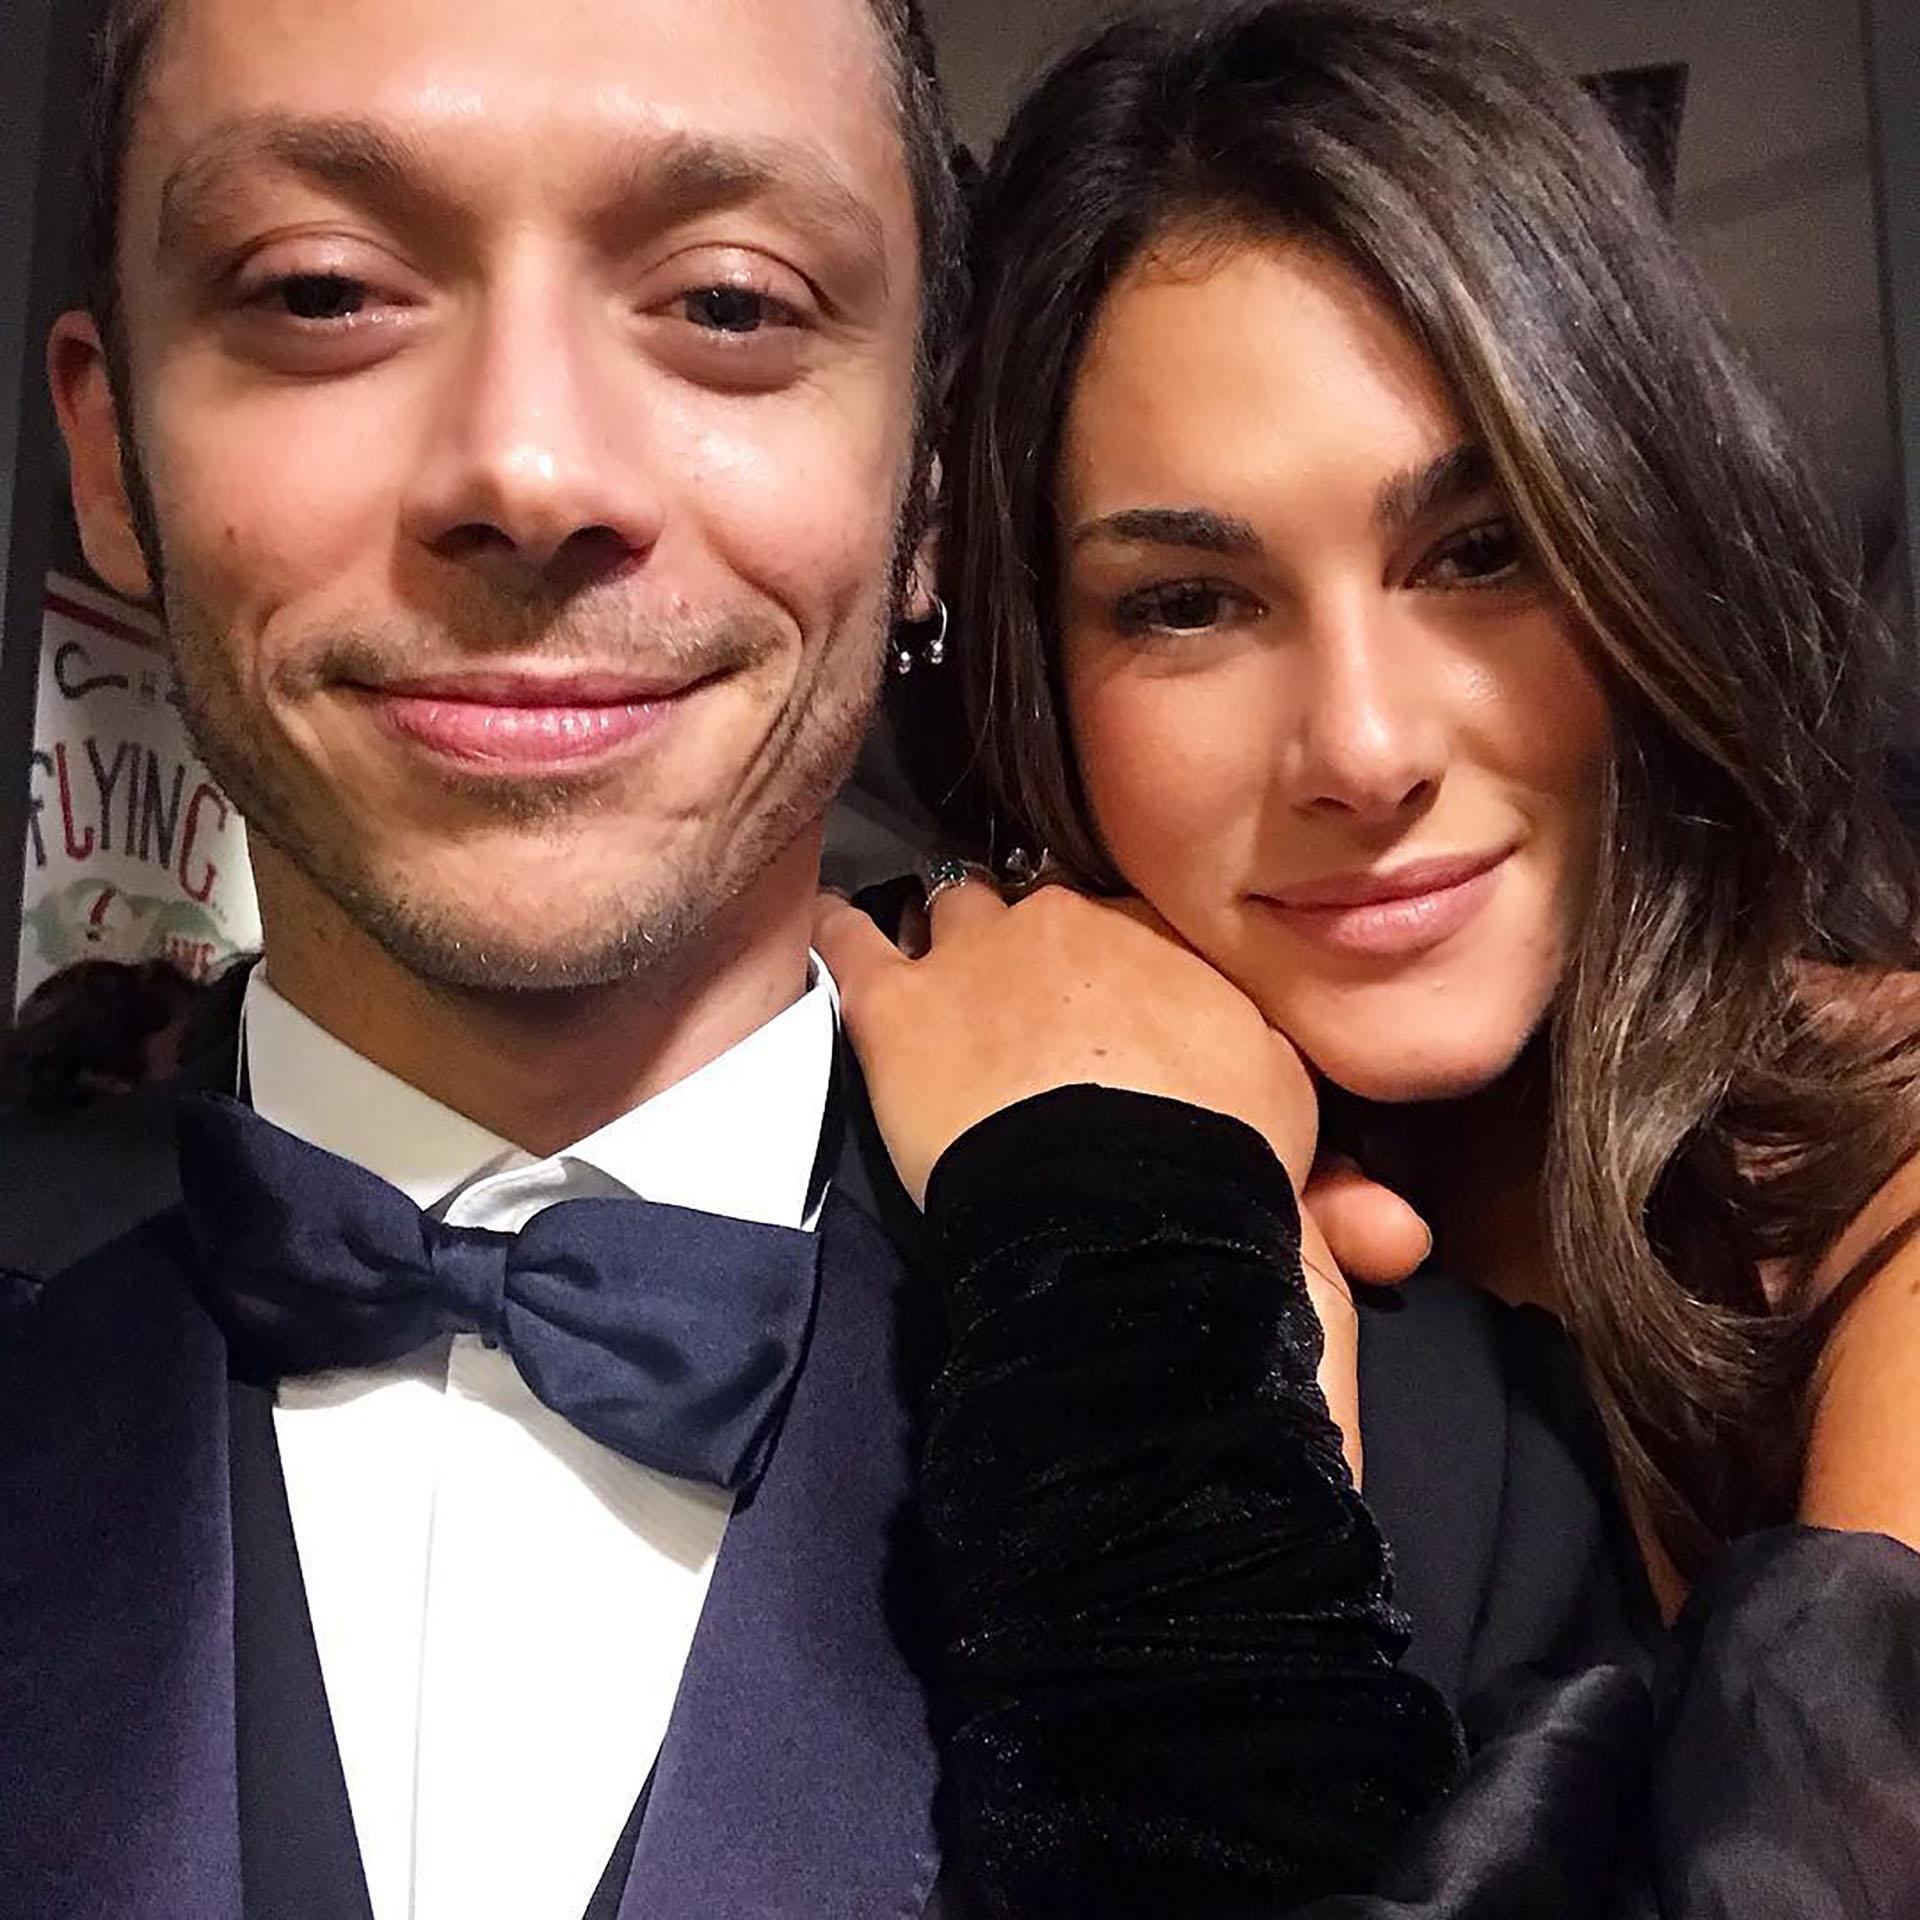 Valentino Rossi, junto a su pareja Francesca Sofia Novello (@francescasofianovello)